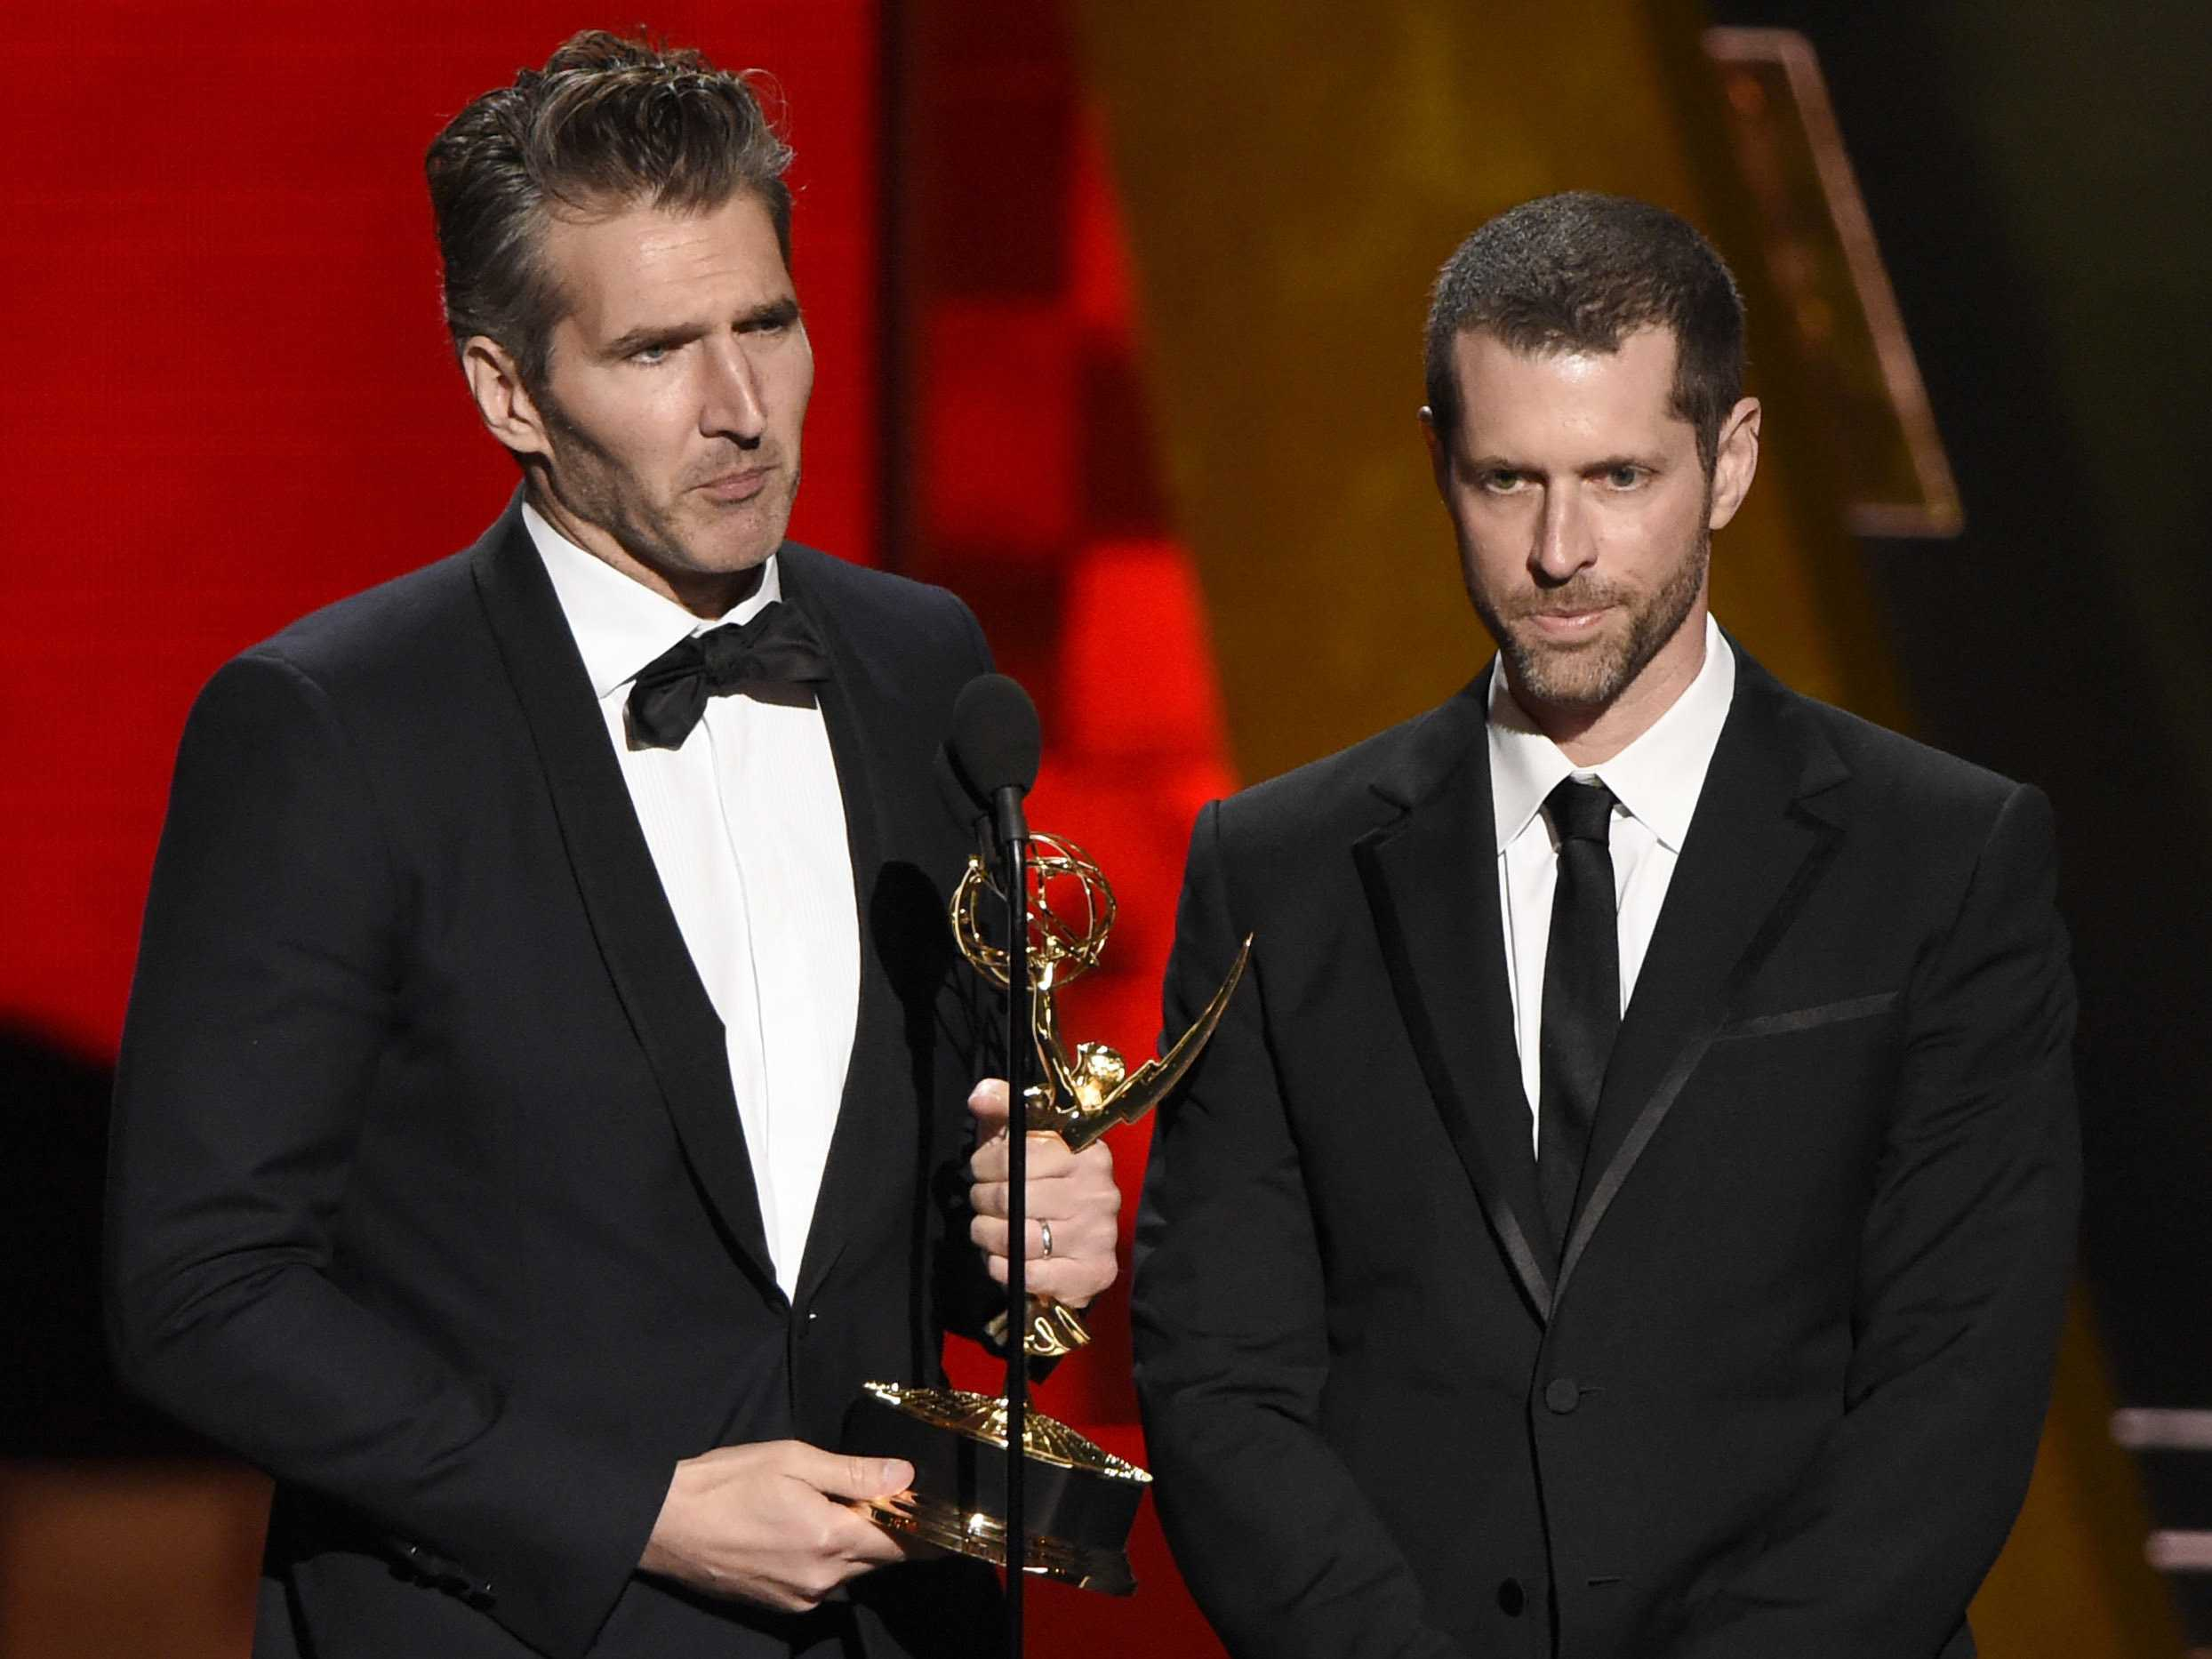 Creators of New HBO Series Address Fears it Glorifies Racism